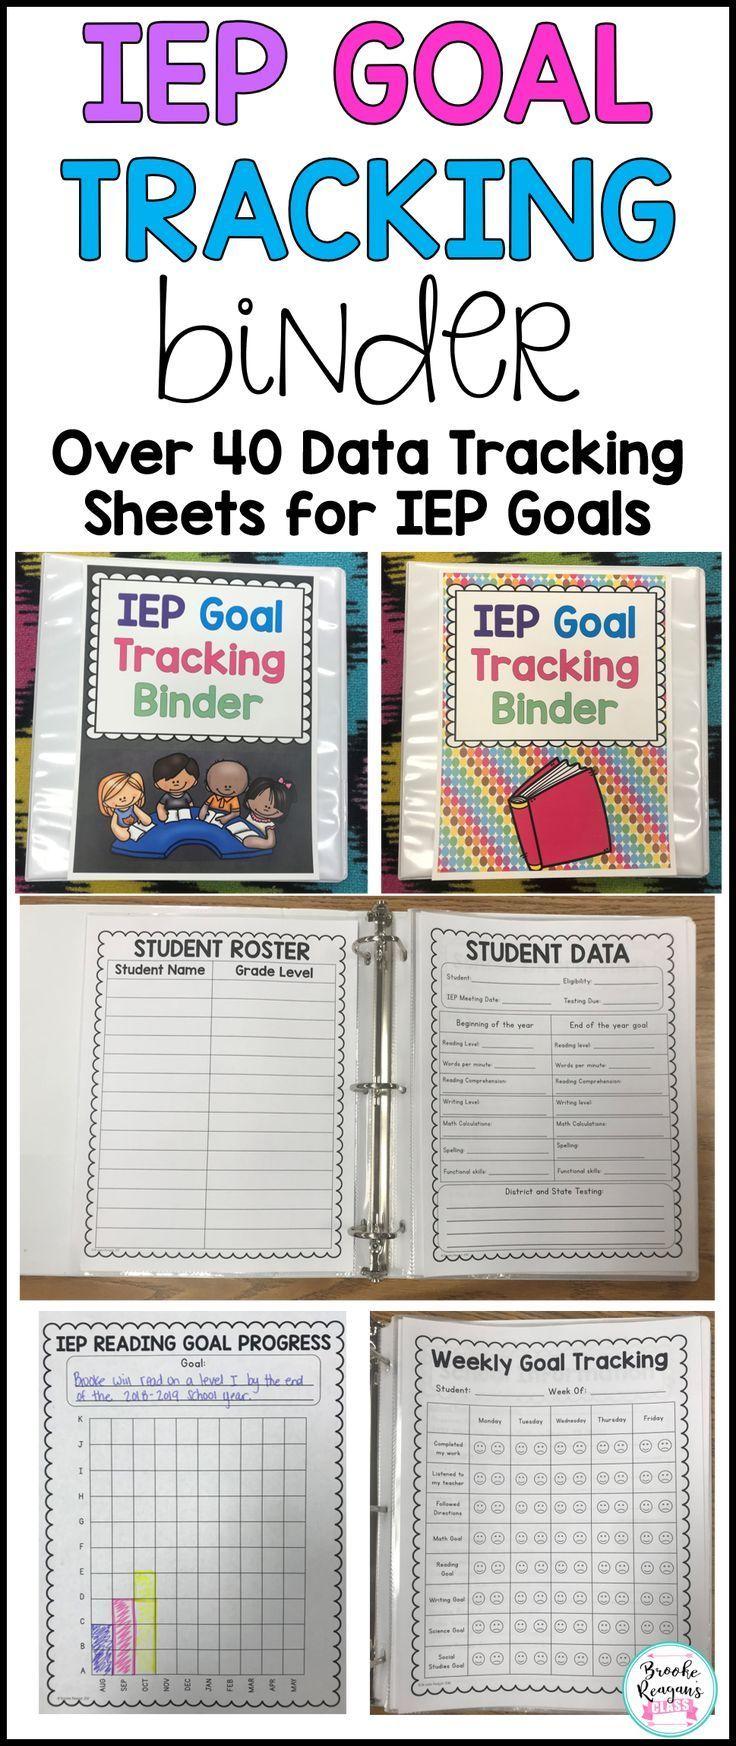 IEP Goal Tracking Binder – data collection for special education #binder #data registration #sonderpadagogik #tracking,